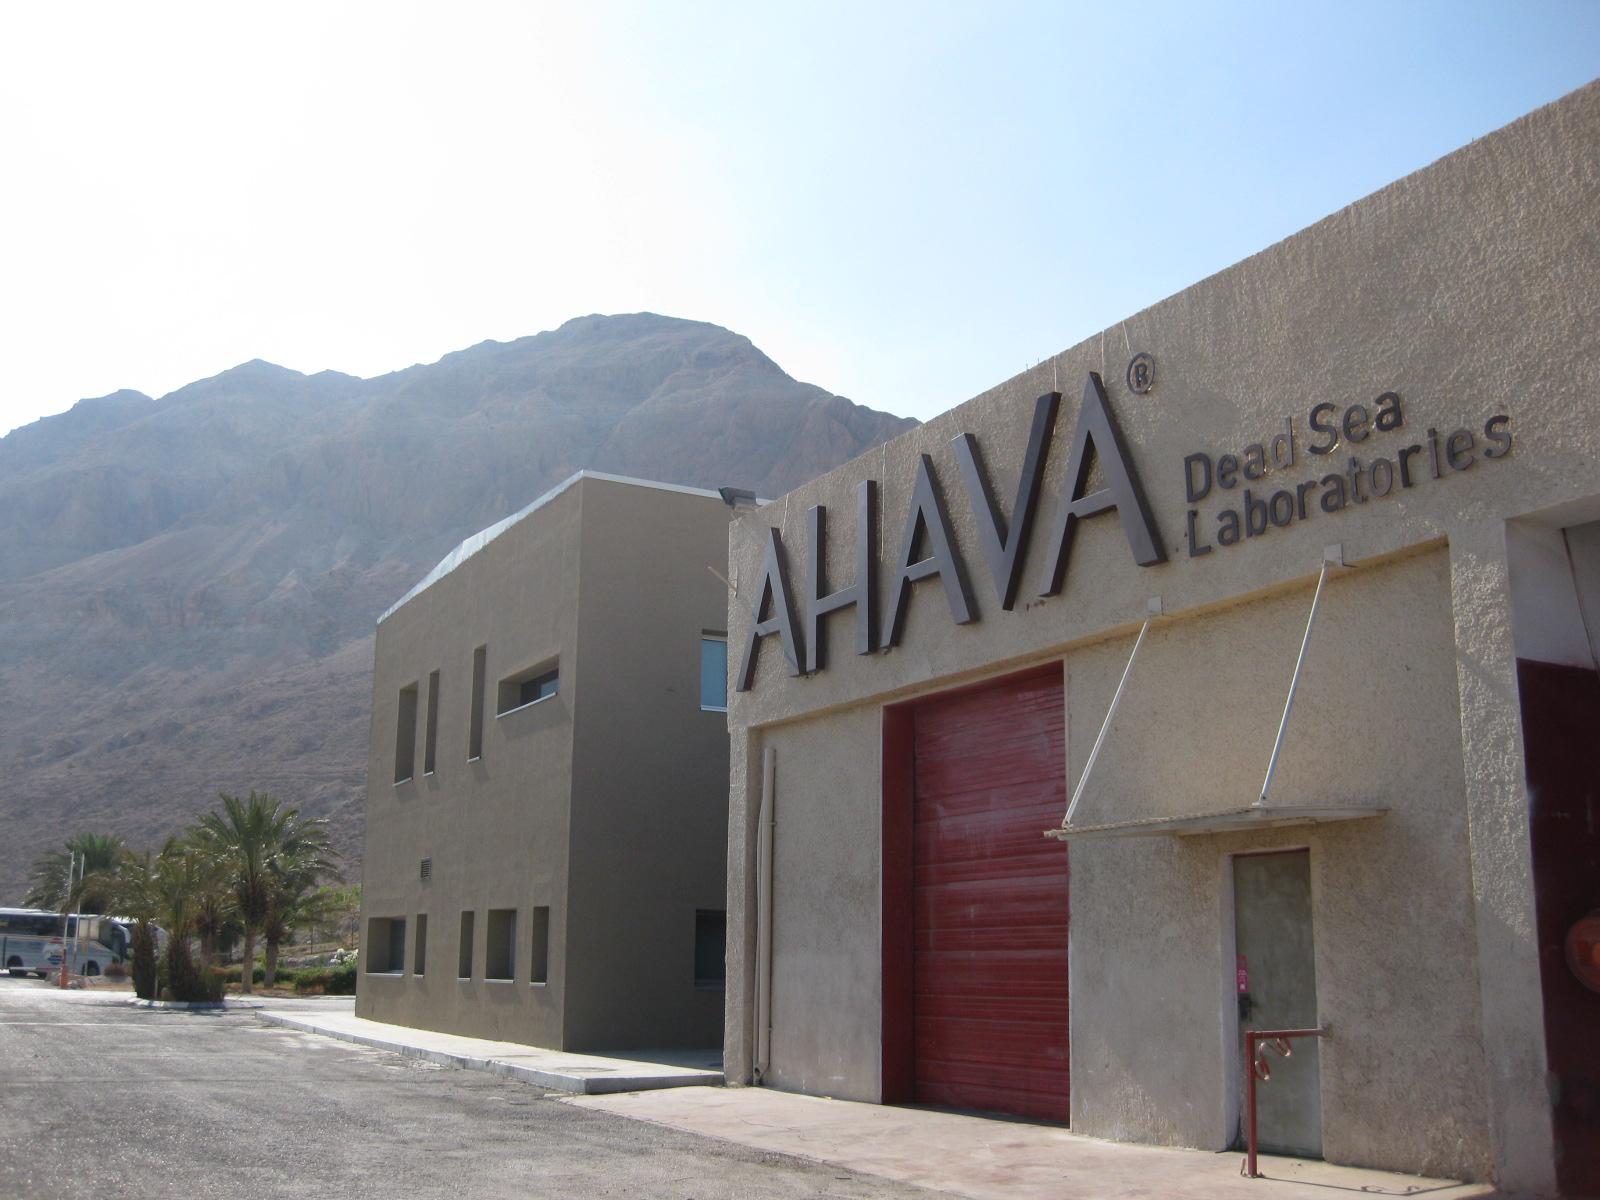 ahava-oct7-2010-007